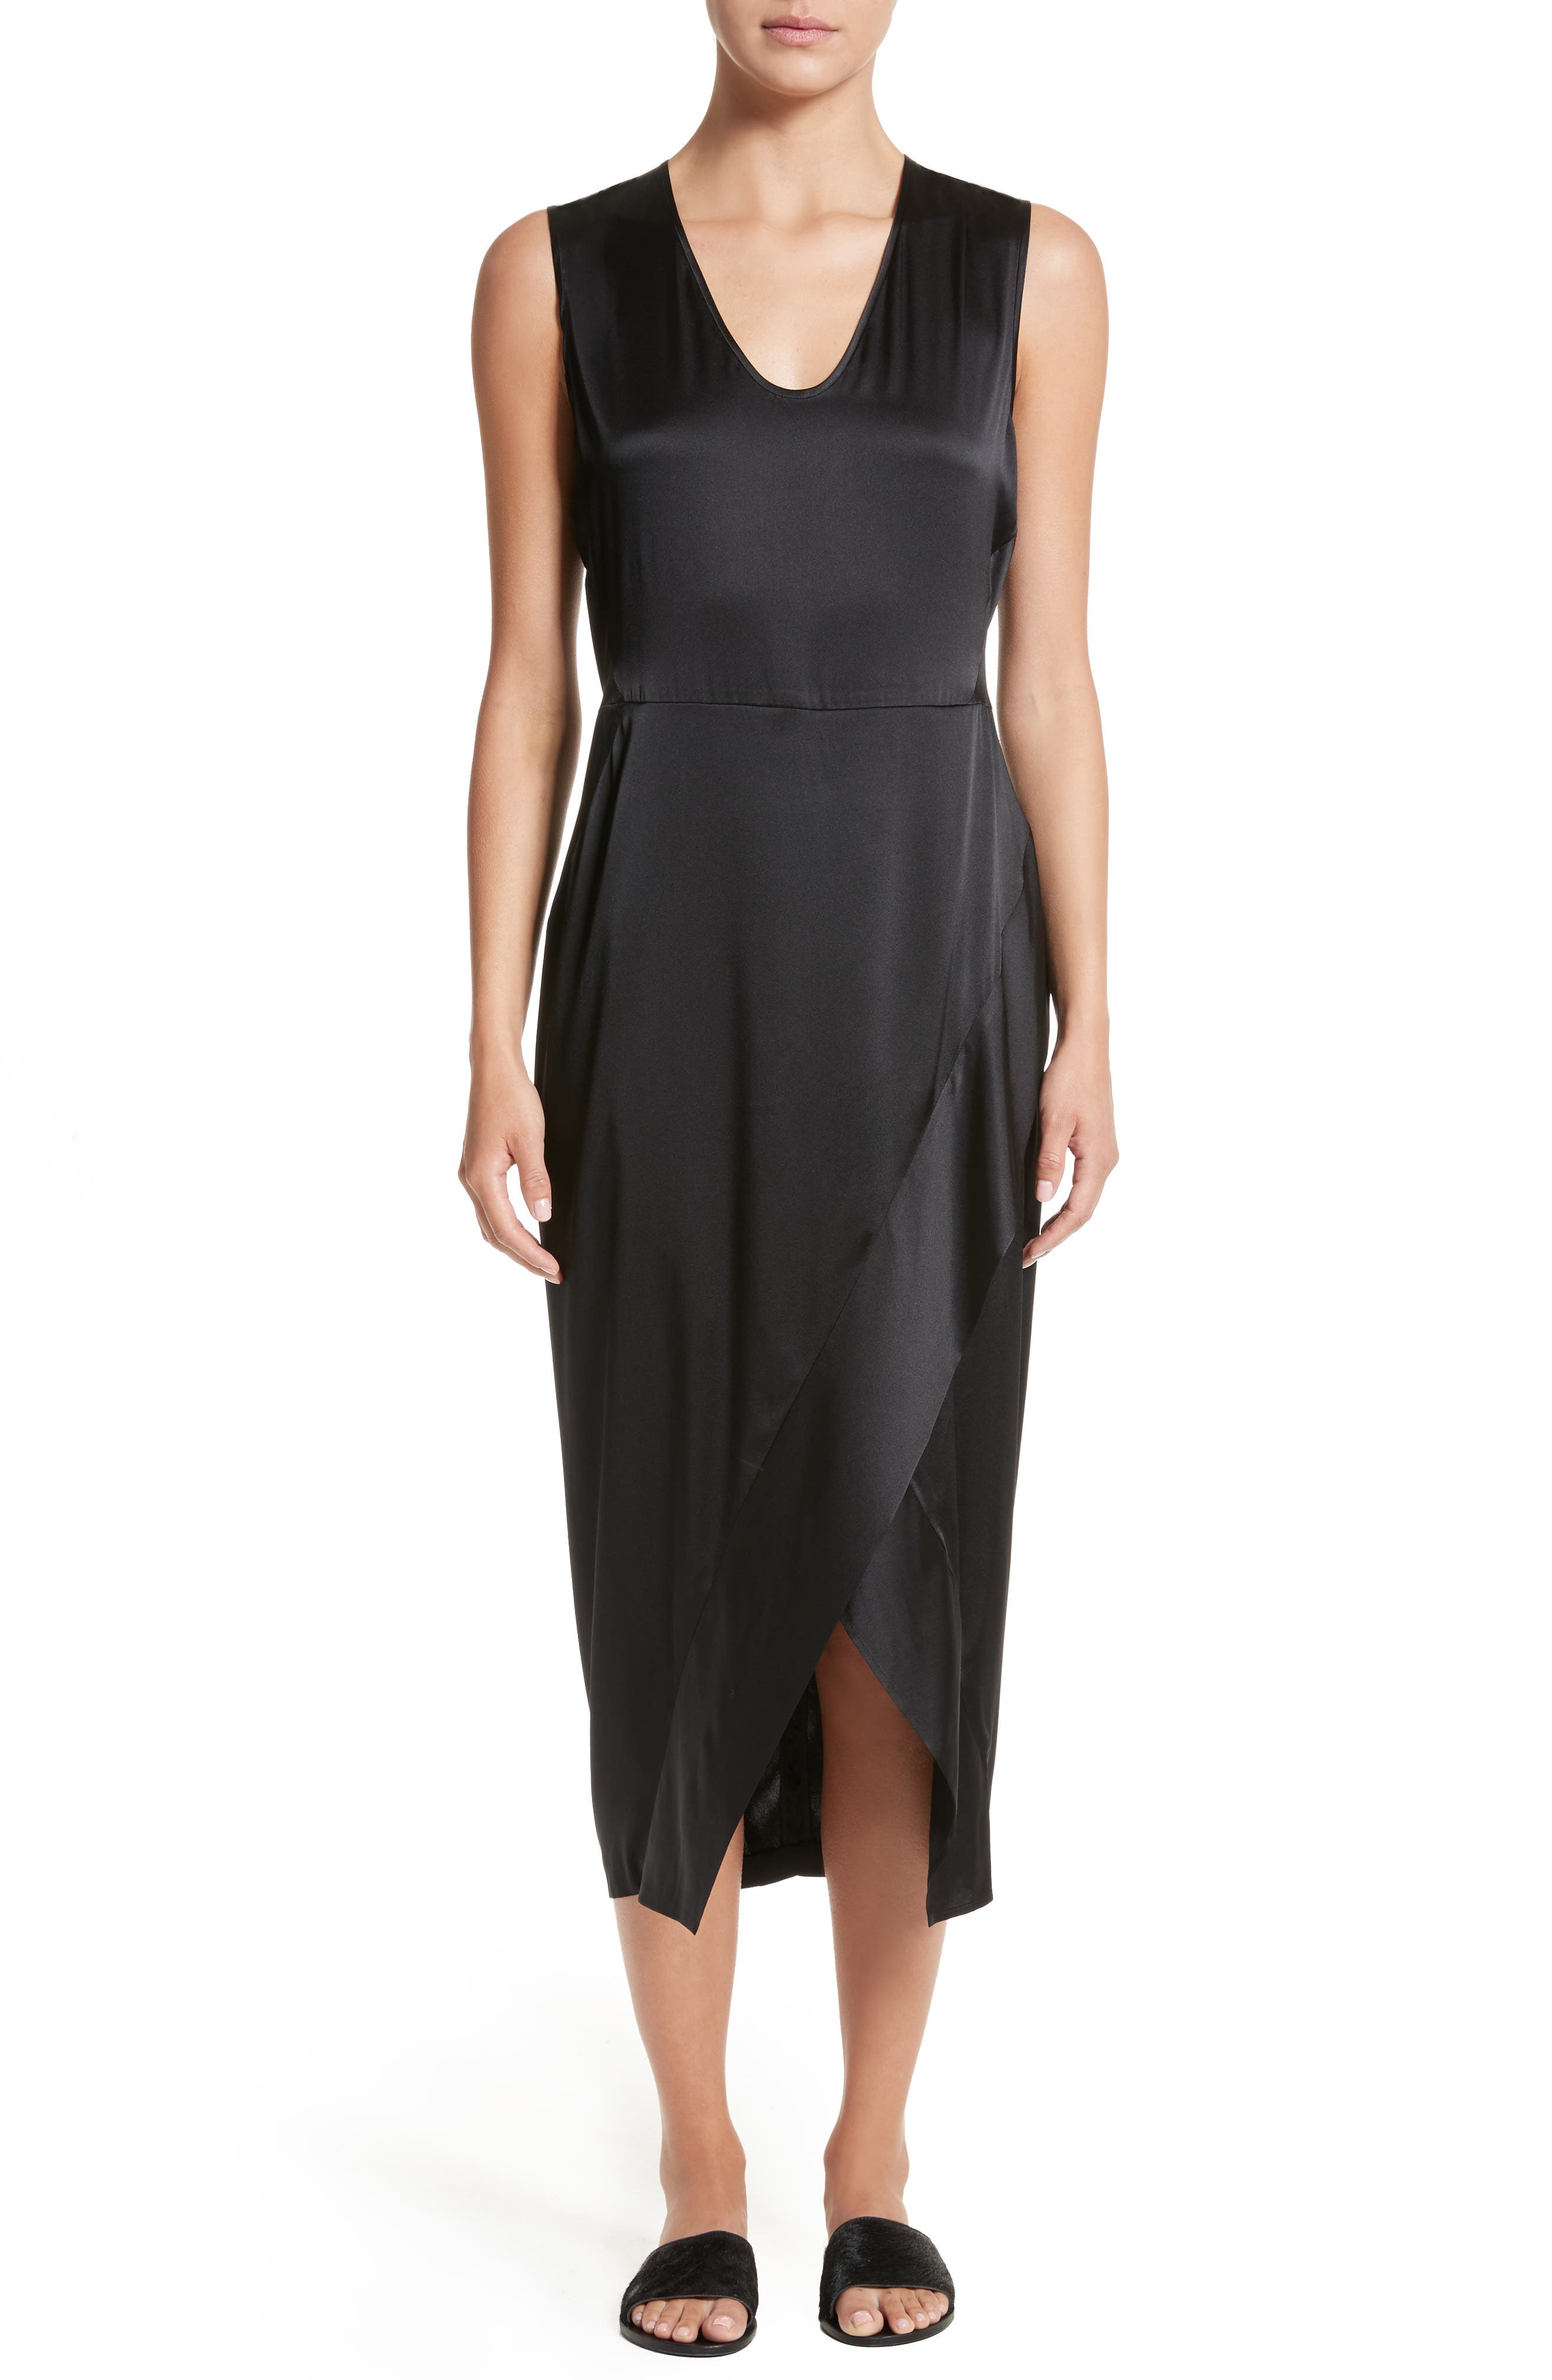 Main Image - Zero + Maria Cornejo Mylla Stretch Silk Charmeuse Dress